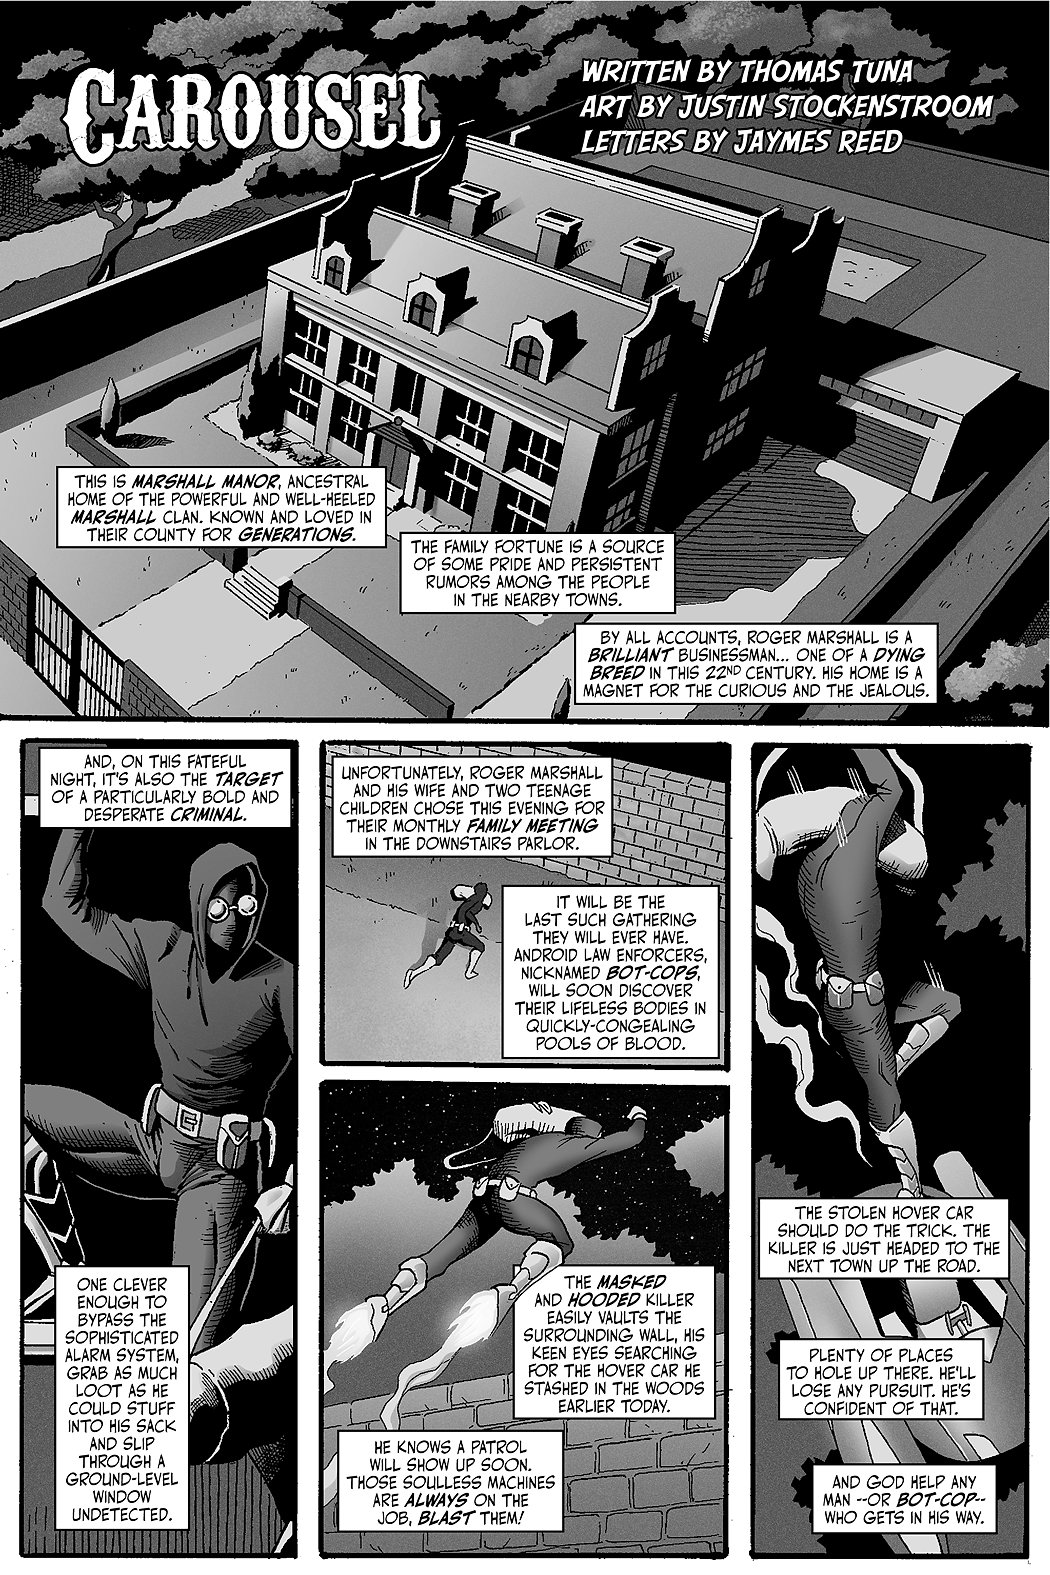 Carousel_Page01.jpg